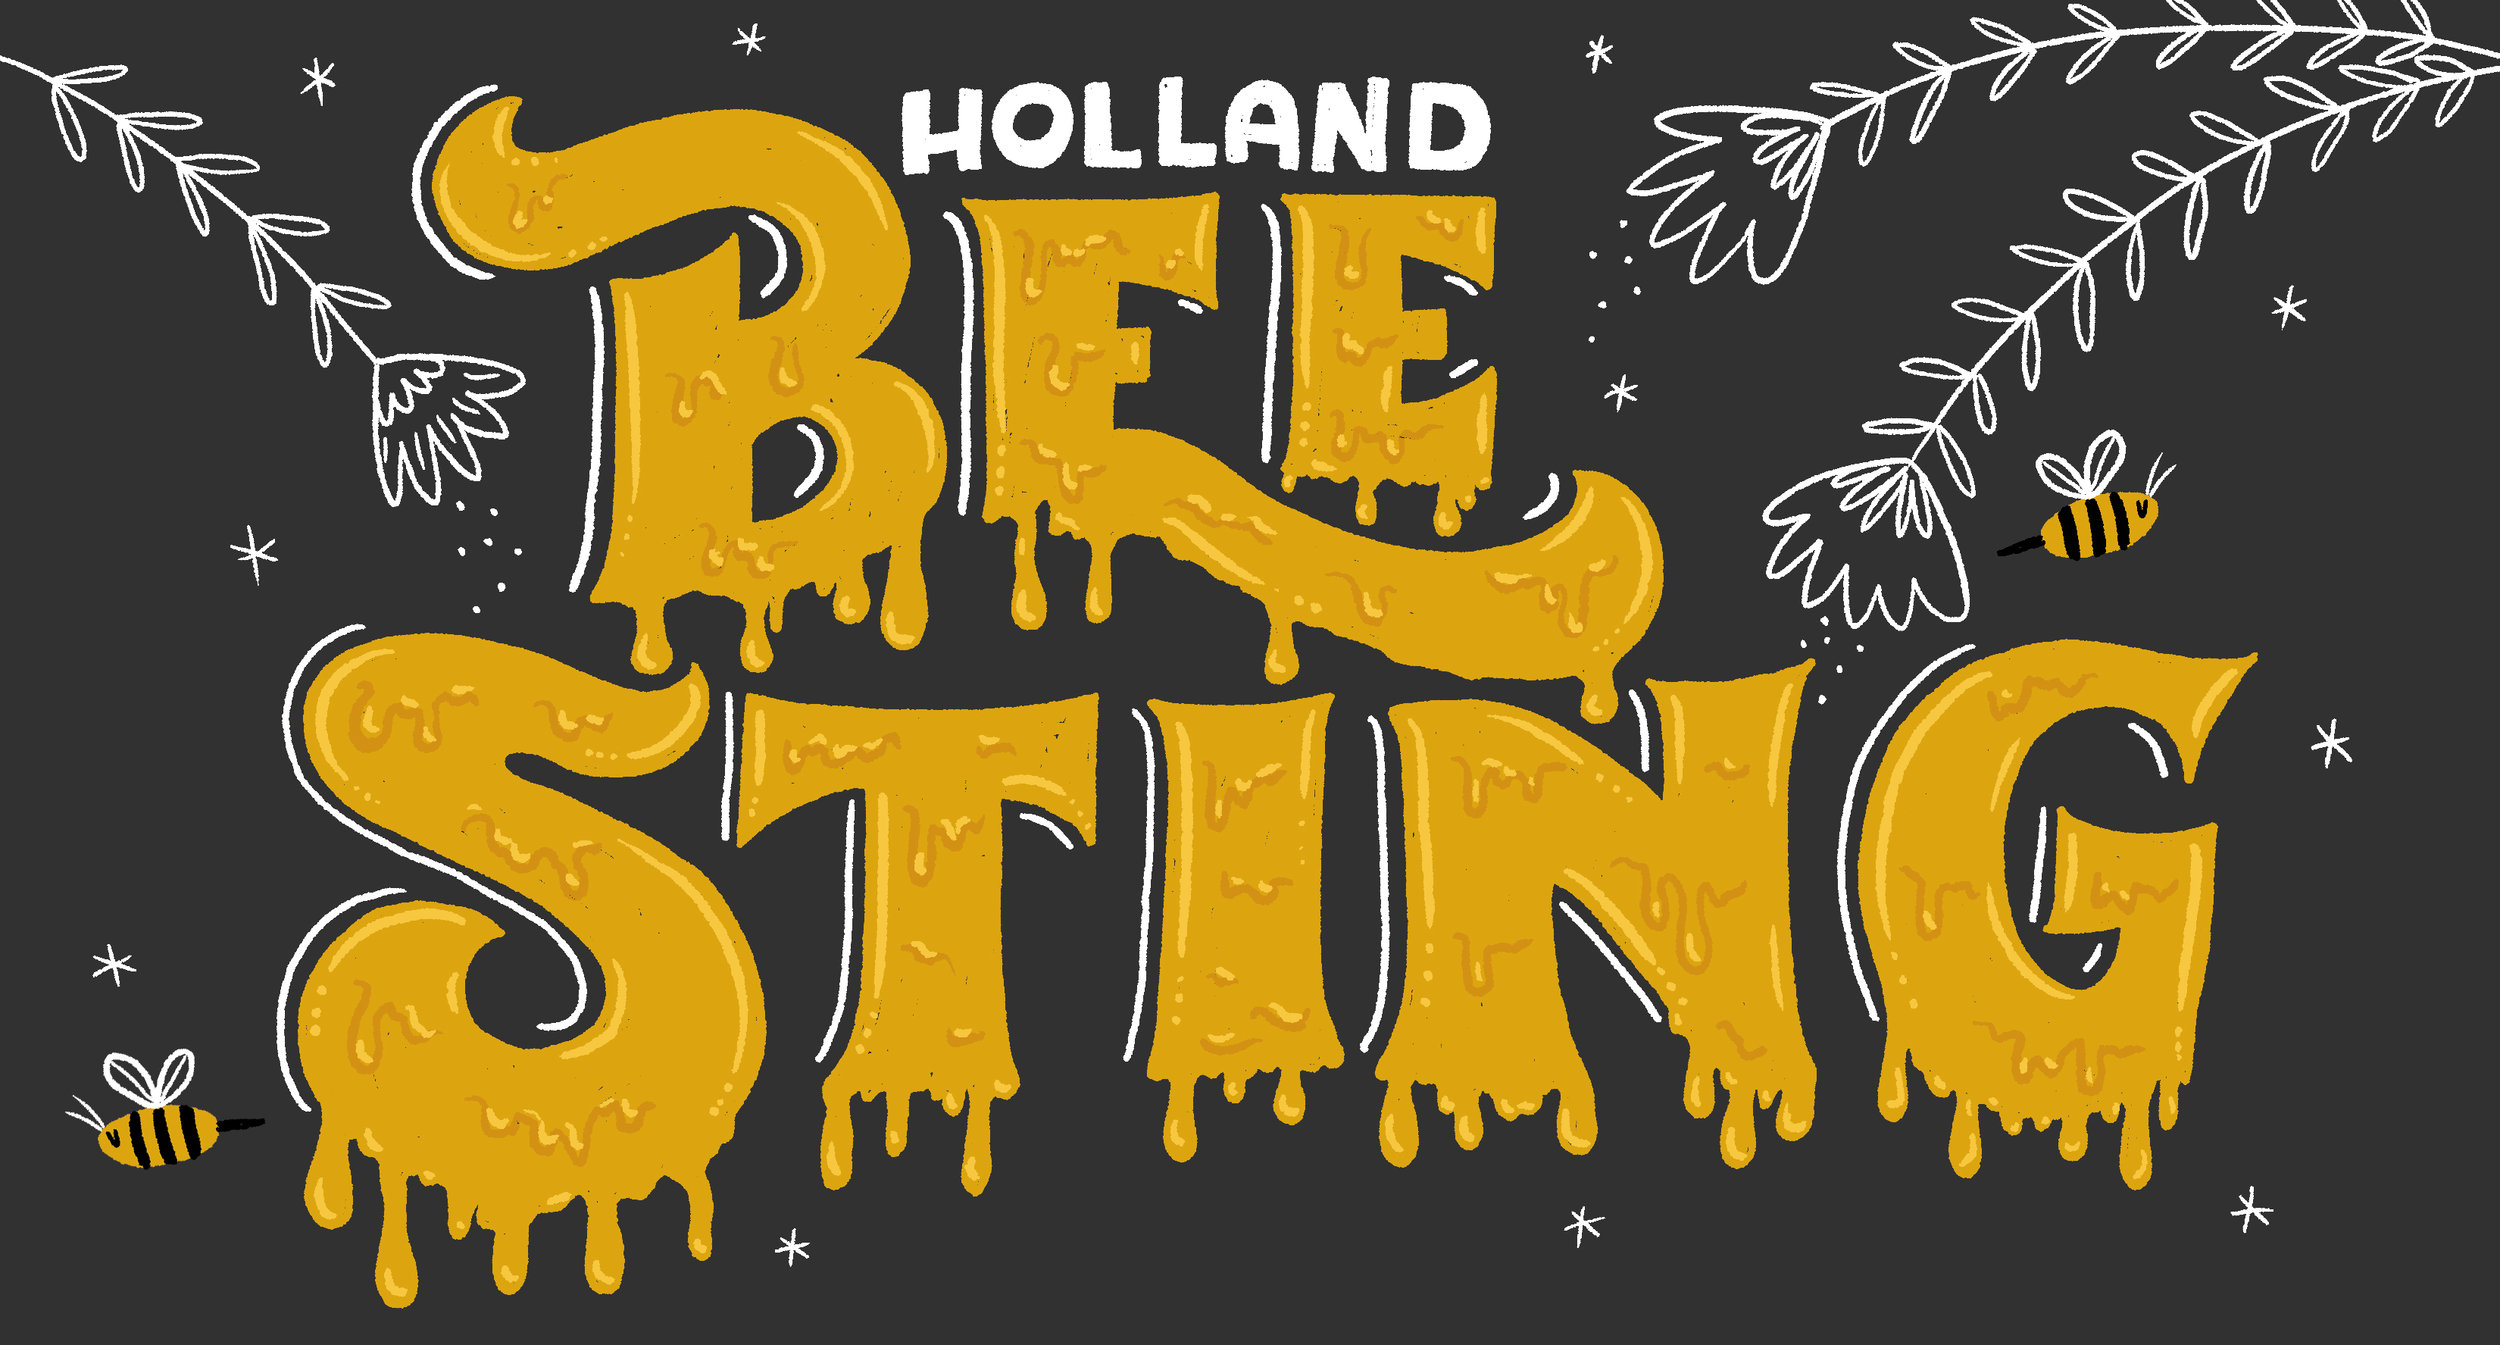 013-holland-bee-sting.jpg